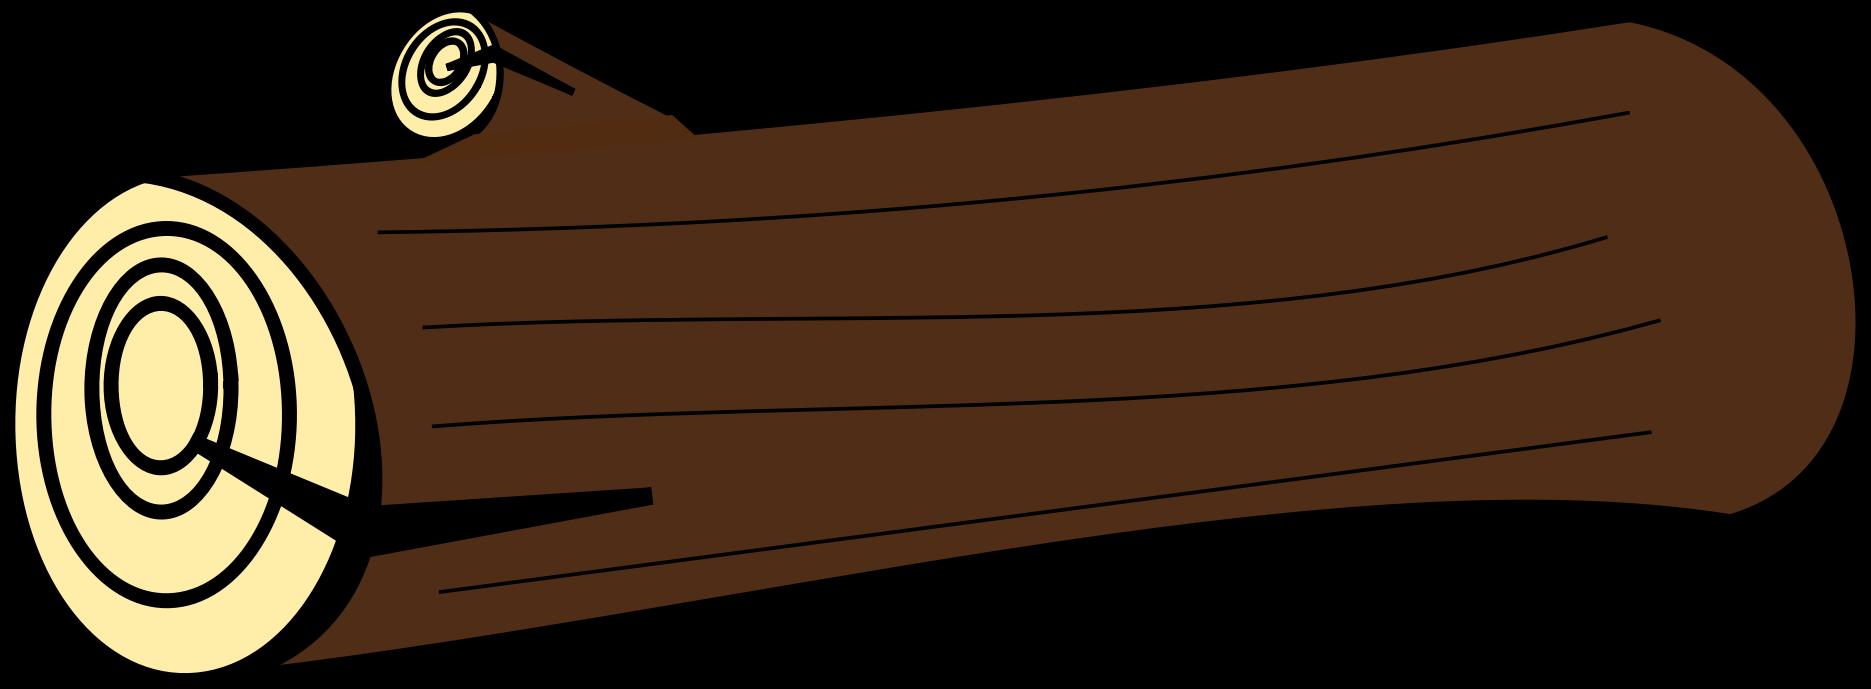 Wooden Log Clipart #1. BIG IMAGE (PNG)